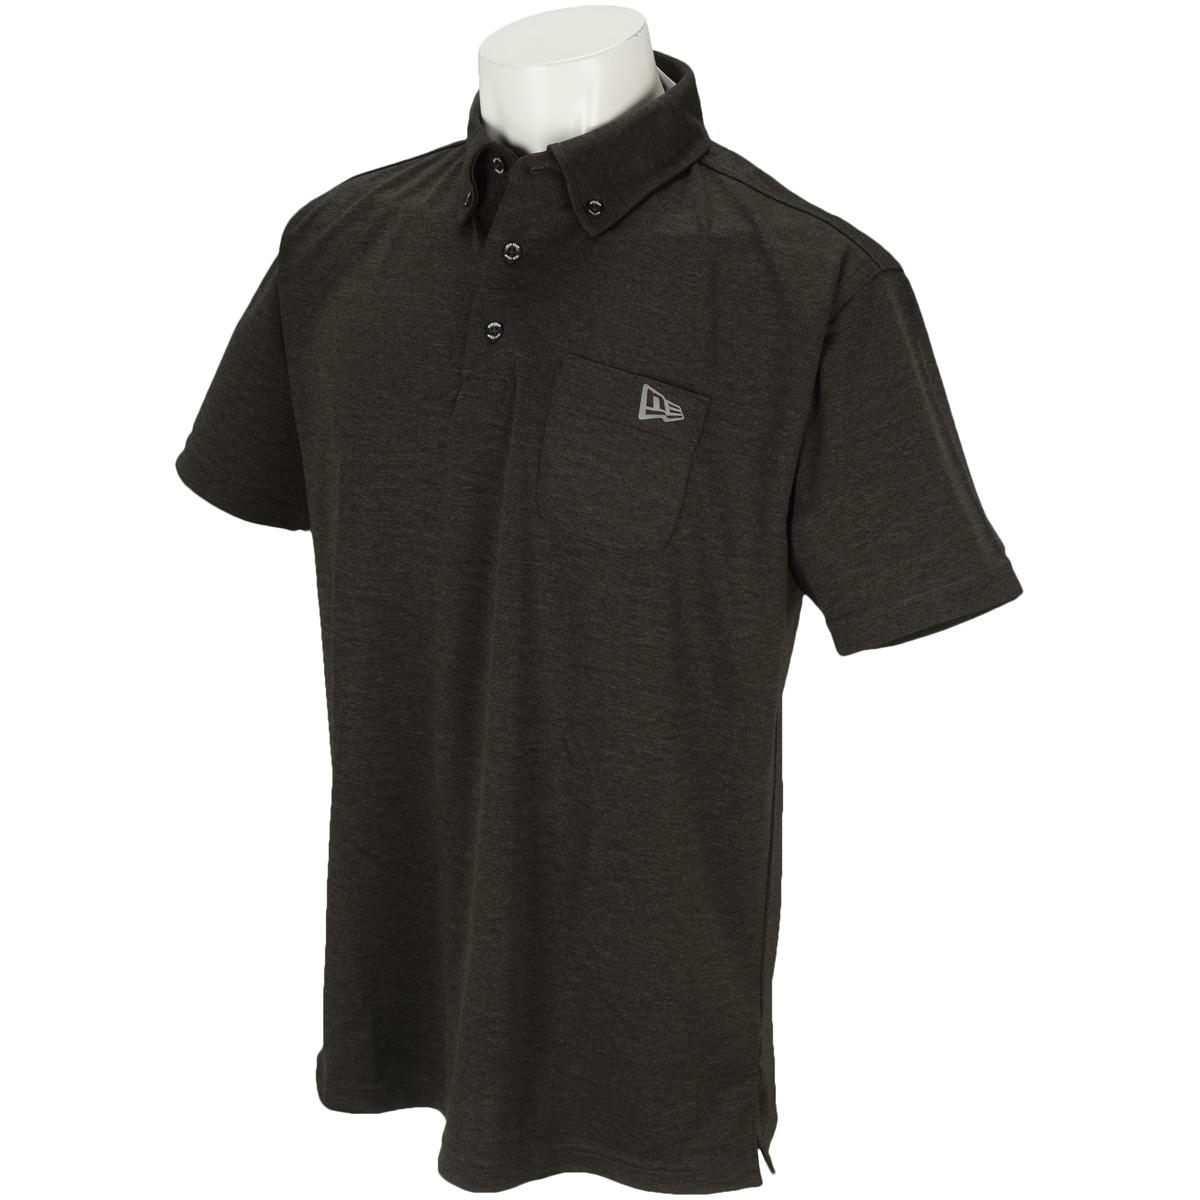 GOLF SC PCKET TEC KNIT 半袖ボタンダウンポロシャツ